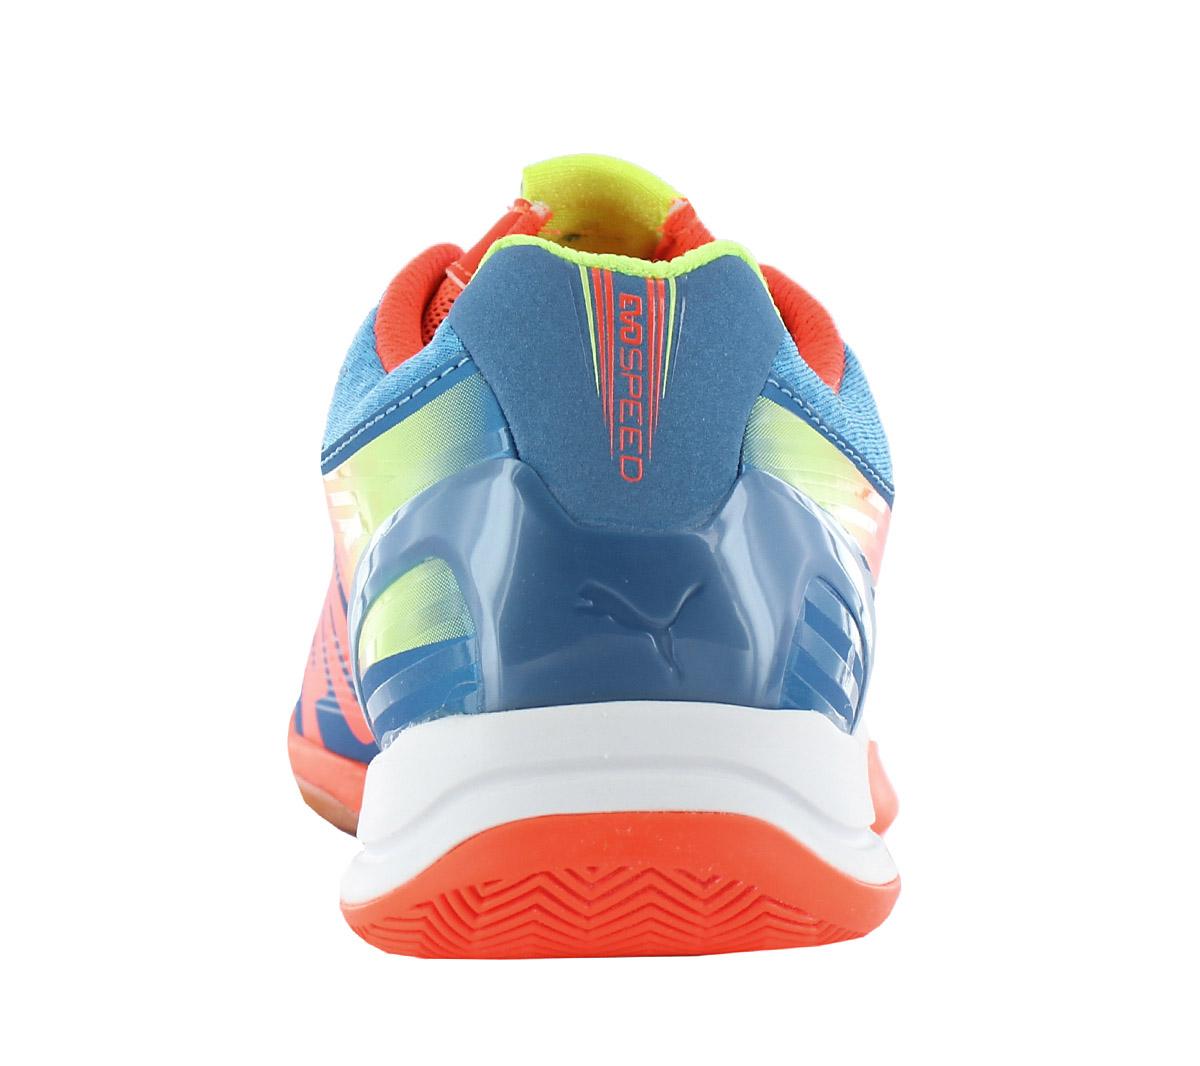 307ee1586 Puma Evospeed Indoor 1.2 Men s Indoor Shoes Handball Squash 102850 ...